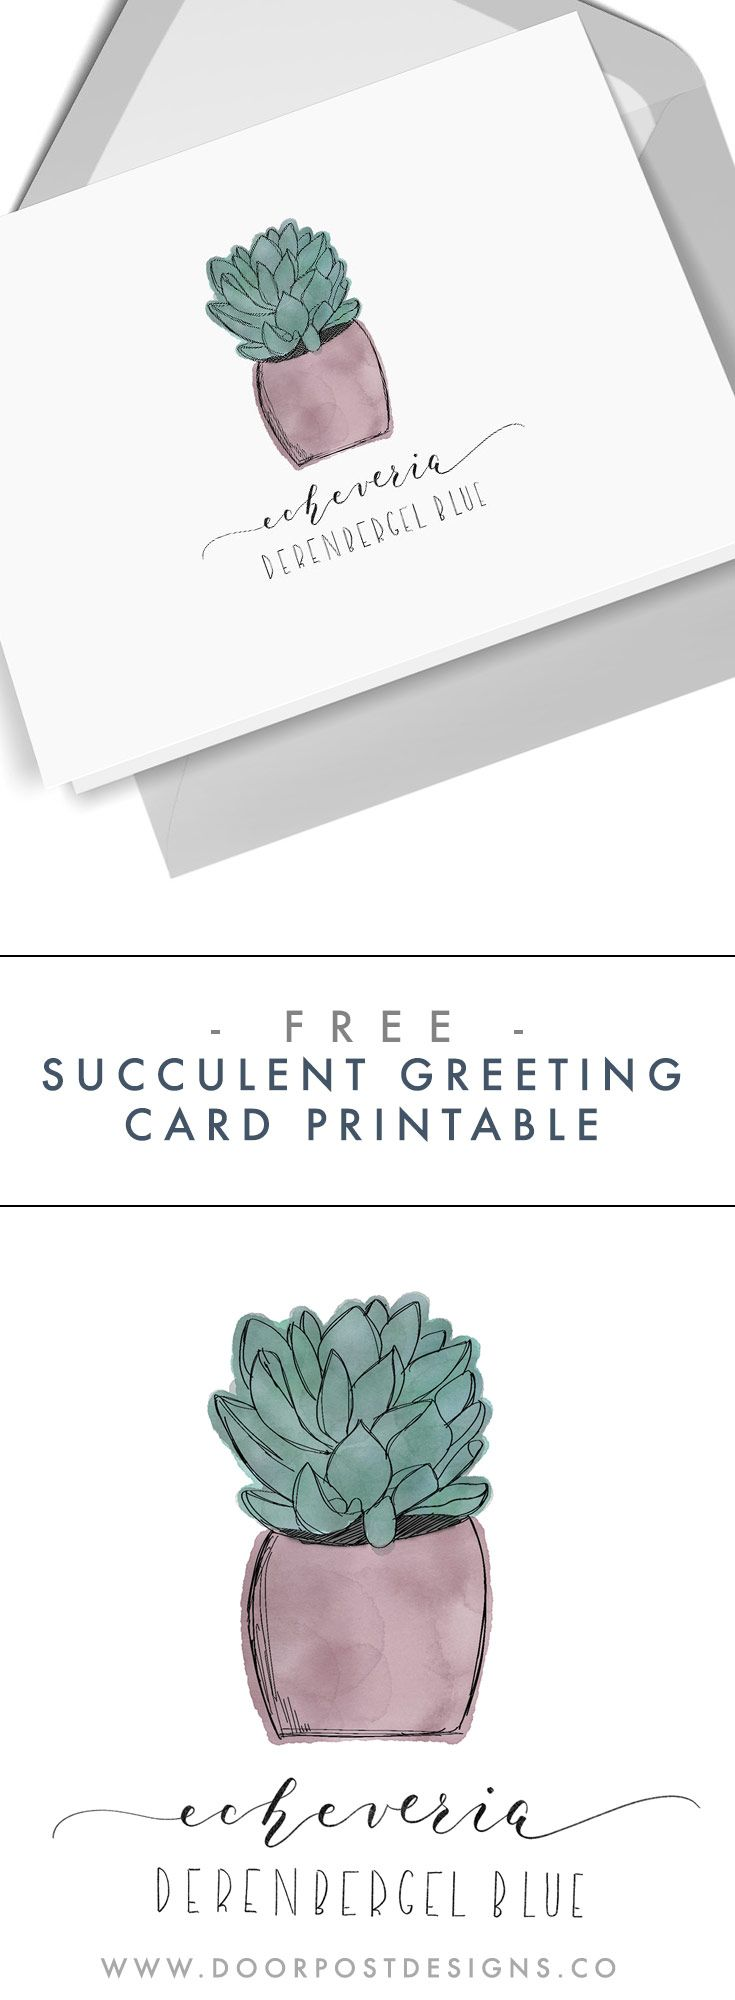 Freebie Printable Succulent Greeting Card Doorpost Designs Printable Greeting Cards Greeting Cards Templates Printable Free